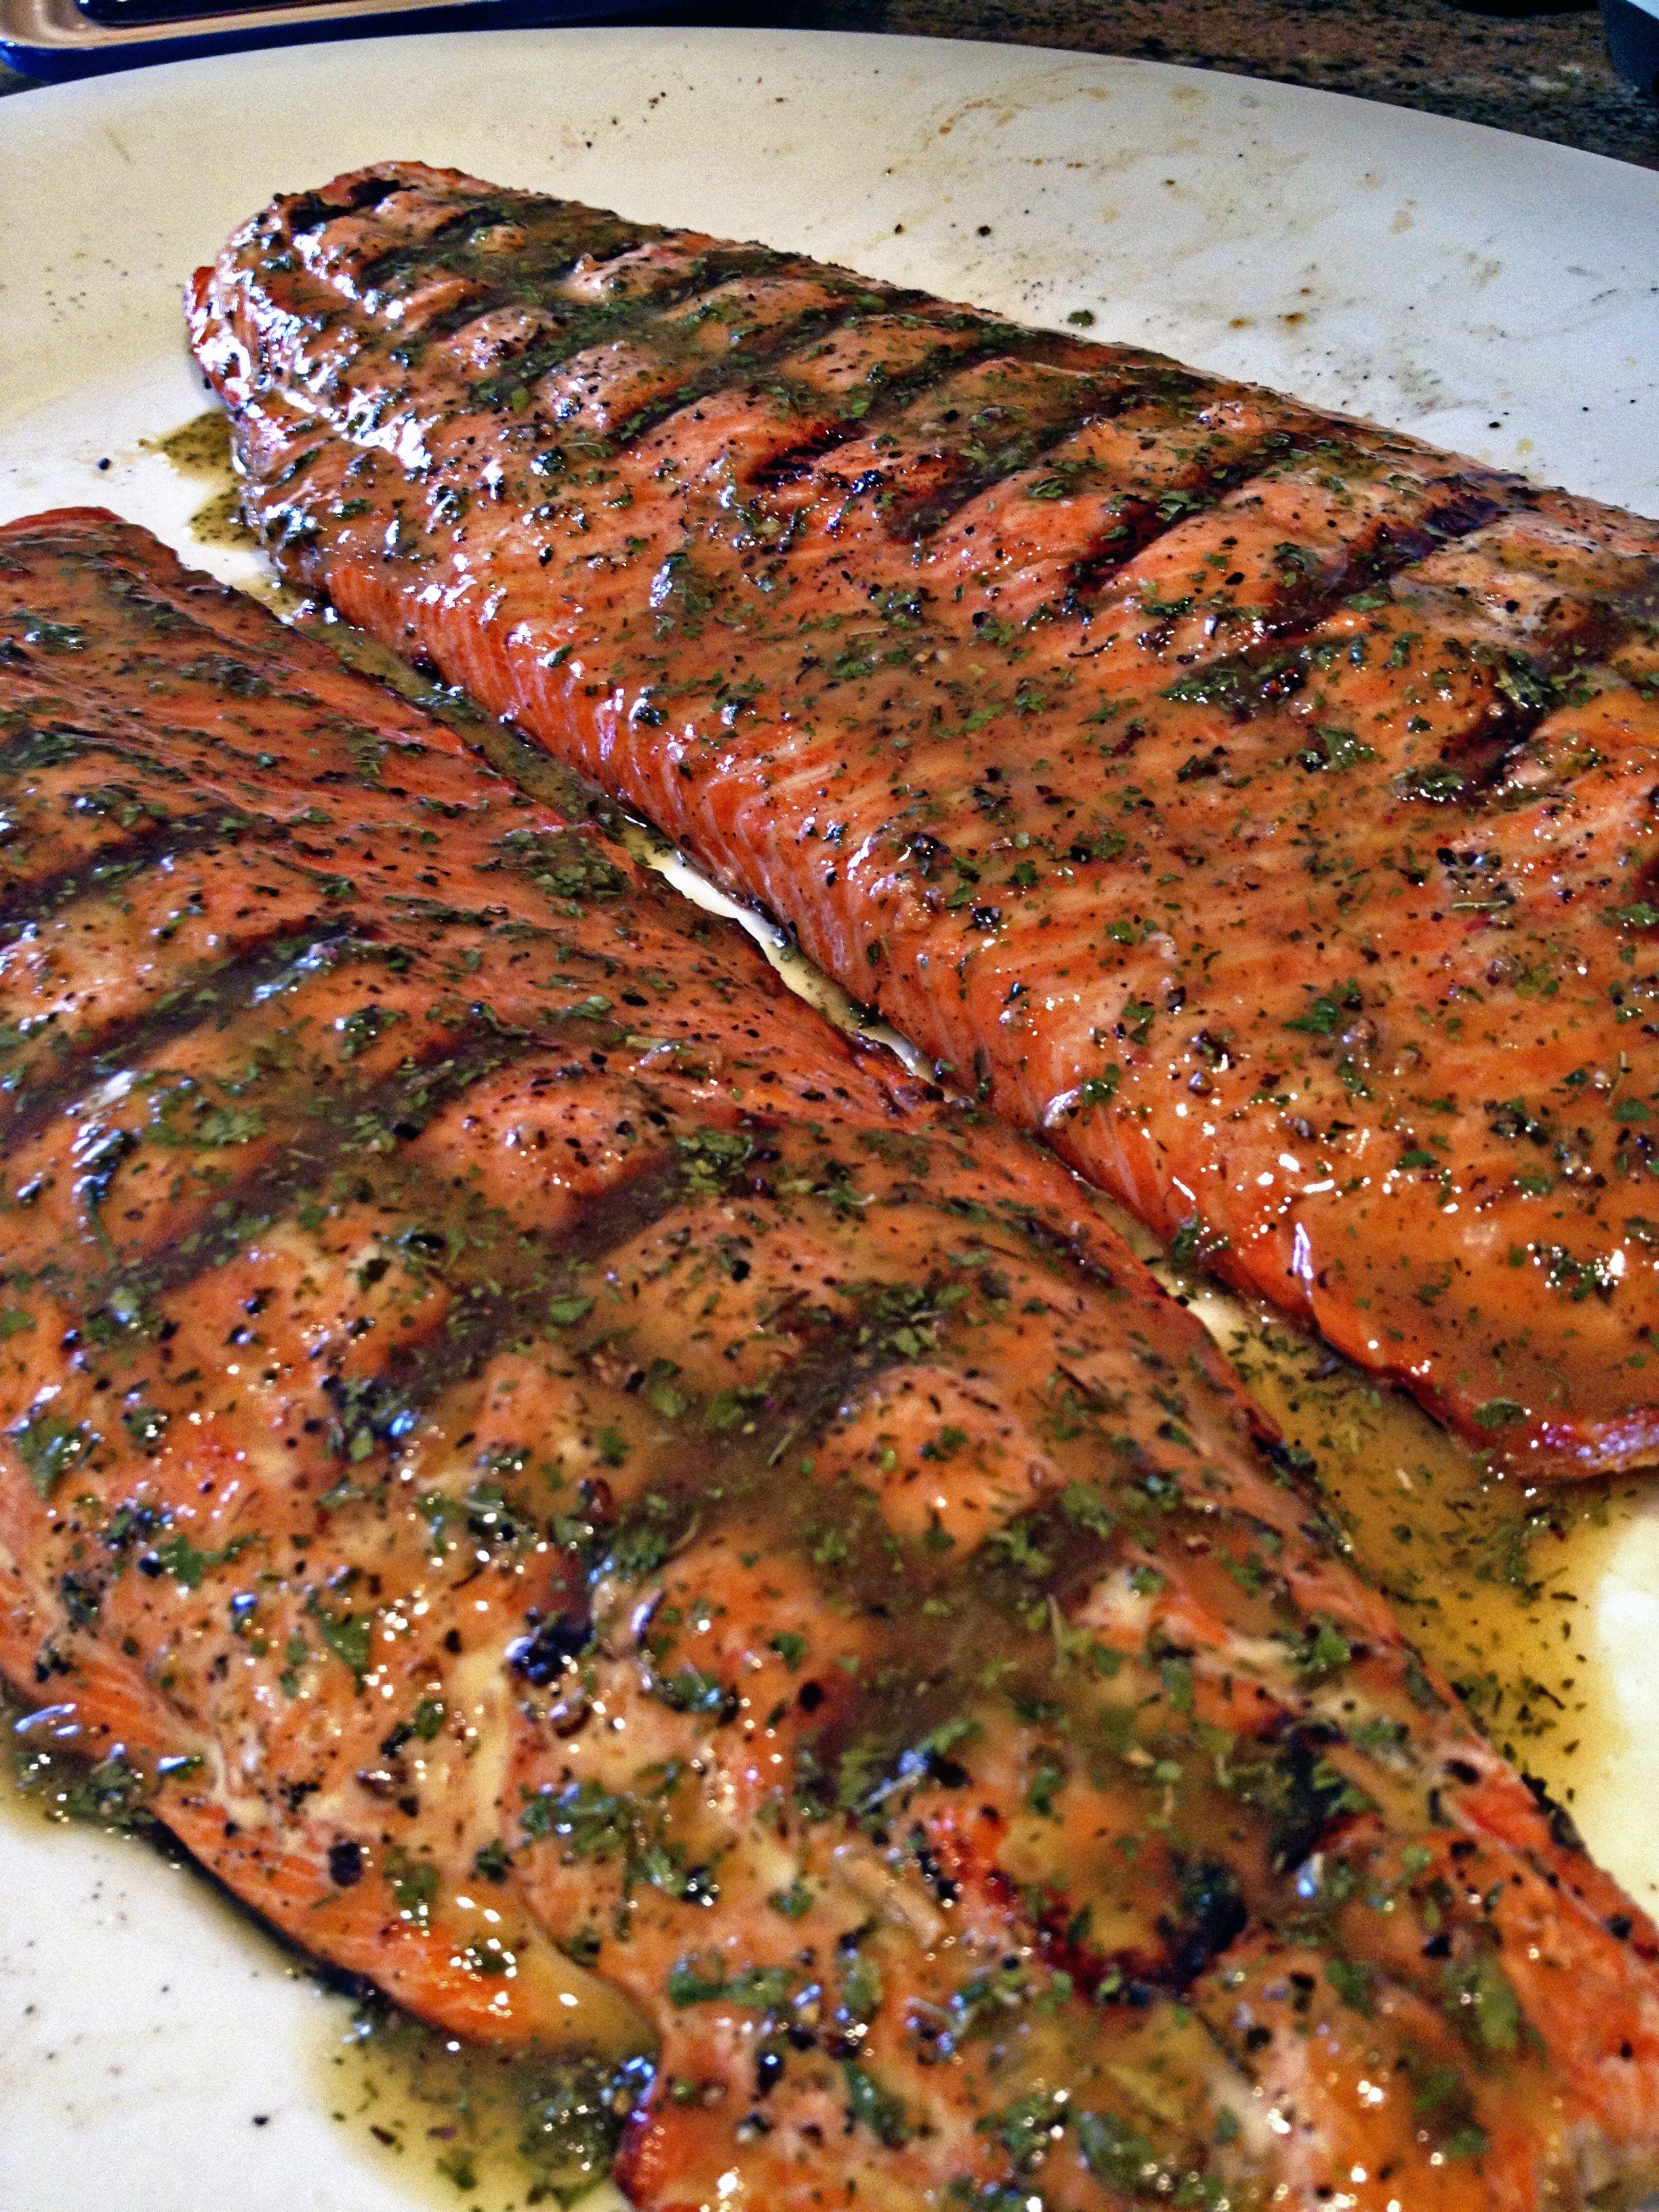 Grilled Amp Glazed Wild Copper River Sockeye Salmon Grilled Salmon Recipes Sockeye Salmon